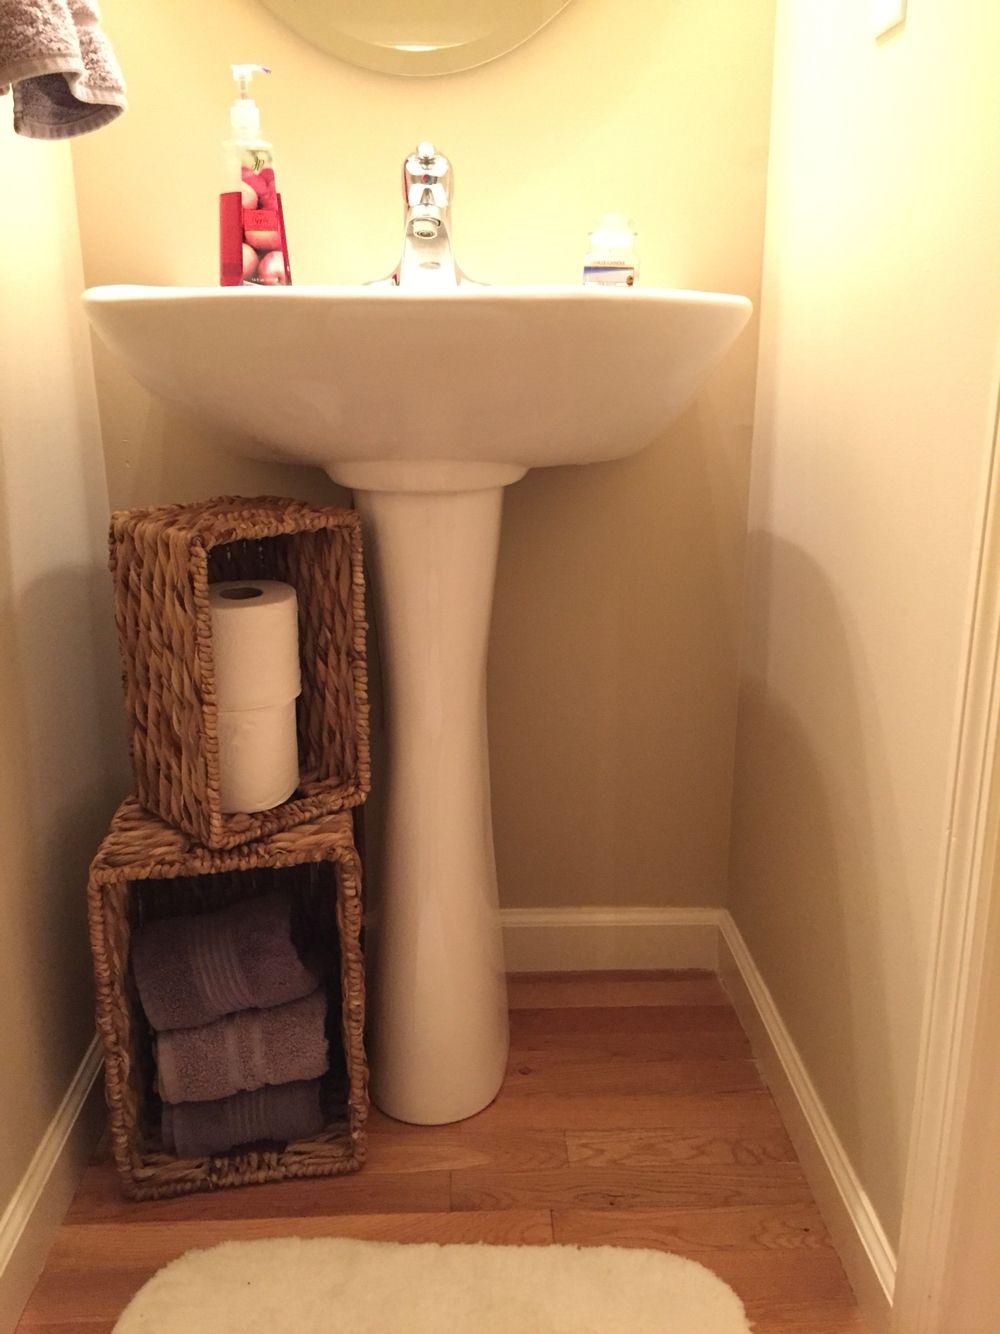 Simple Way To Cover Up Sink Pipes Space Saving Bathroom Diy Bathroom Storage Diy Bathroom